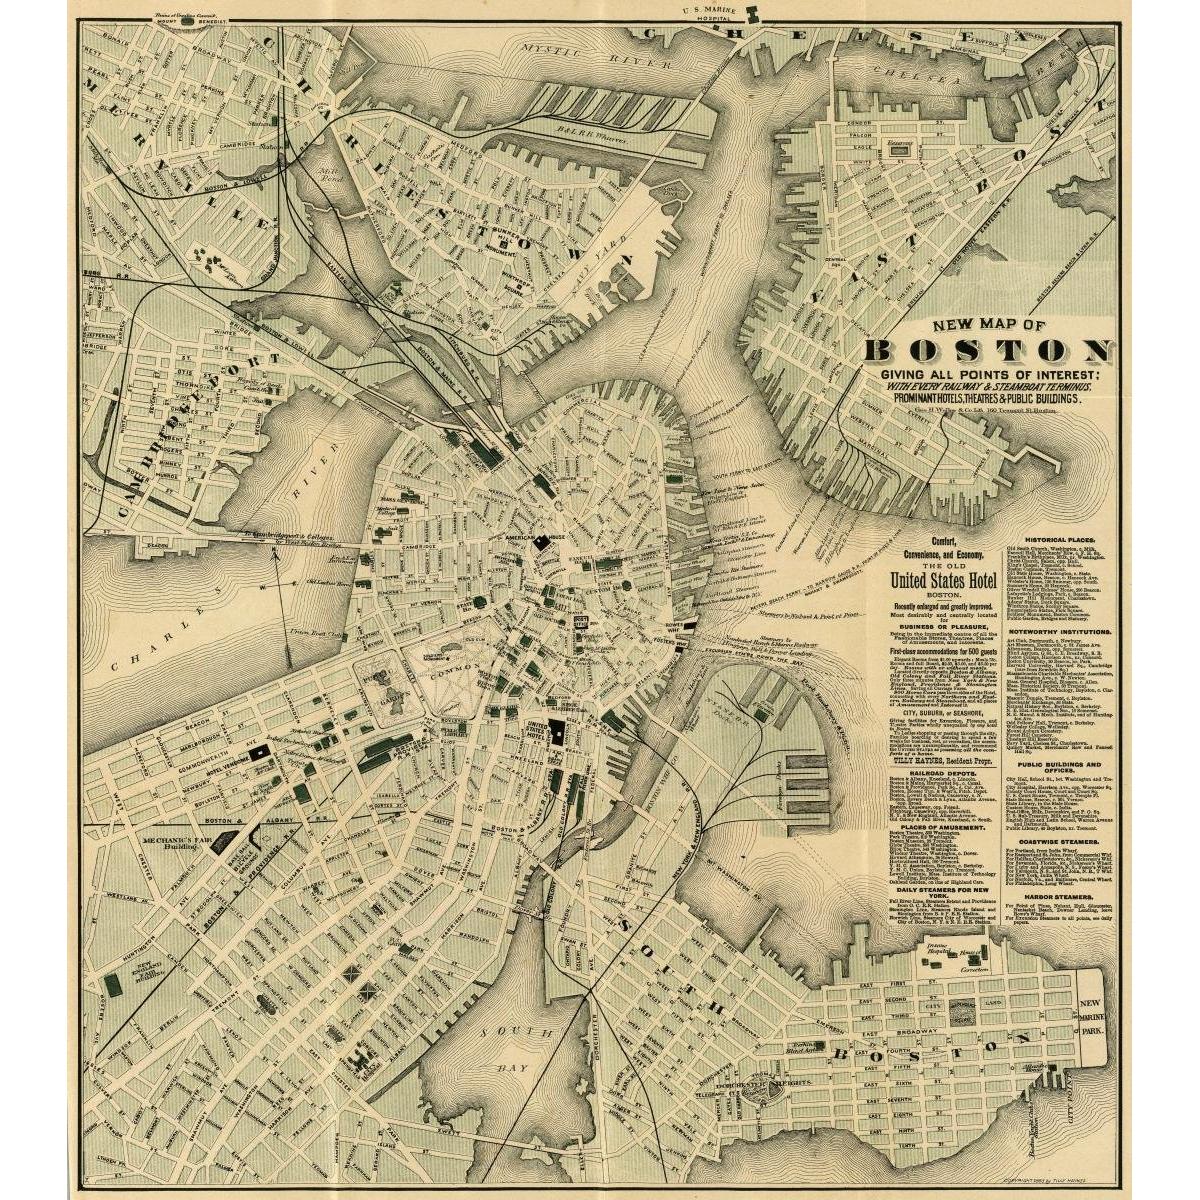 City of Boston Map, 1884 | Celebrating American Cities | Pinterest ...